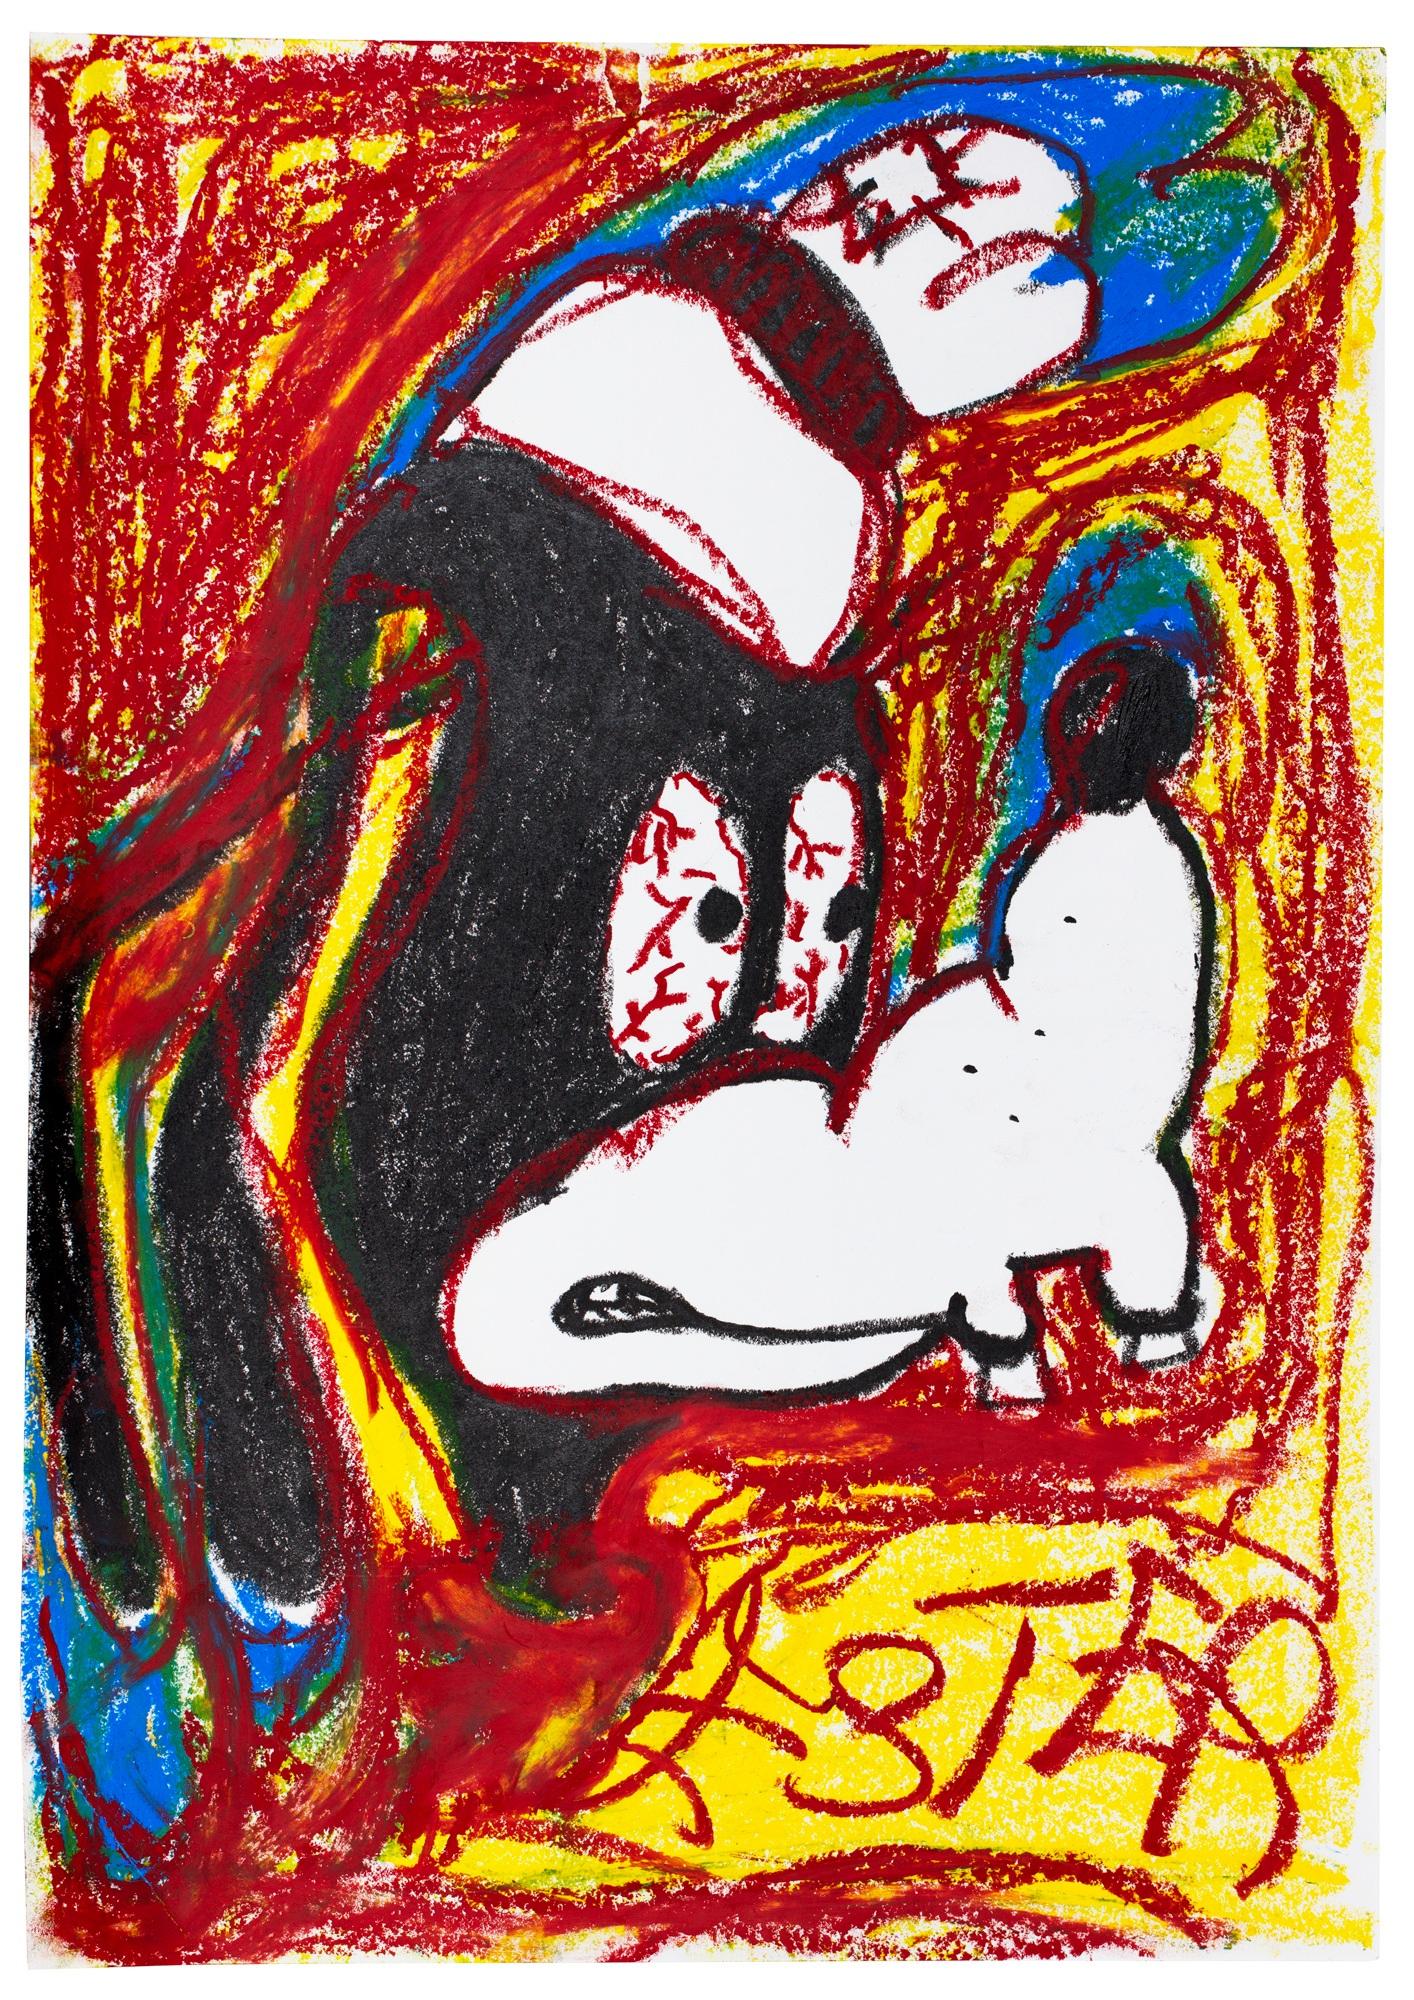 Ester Eriksson  Untitled    2019 Pastel on paper 42 x 30 cm